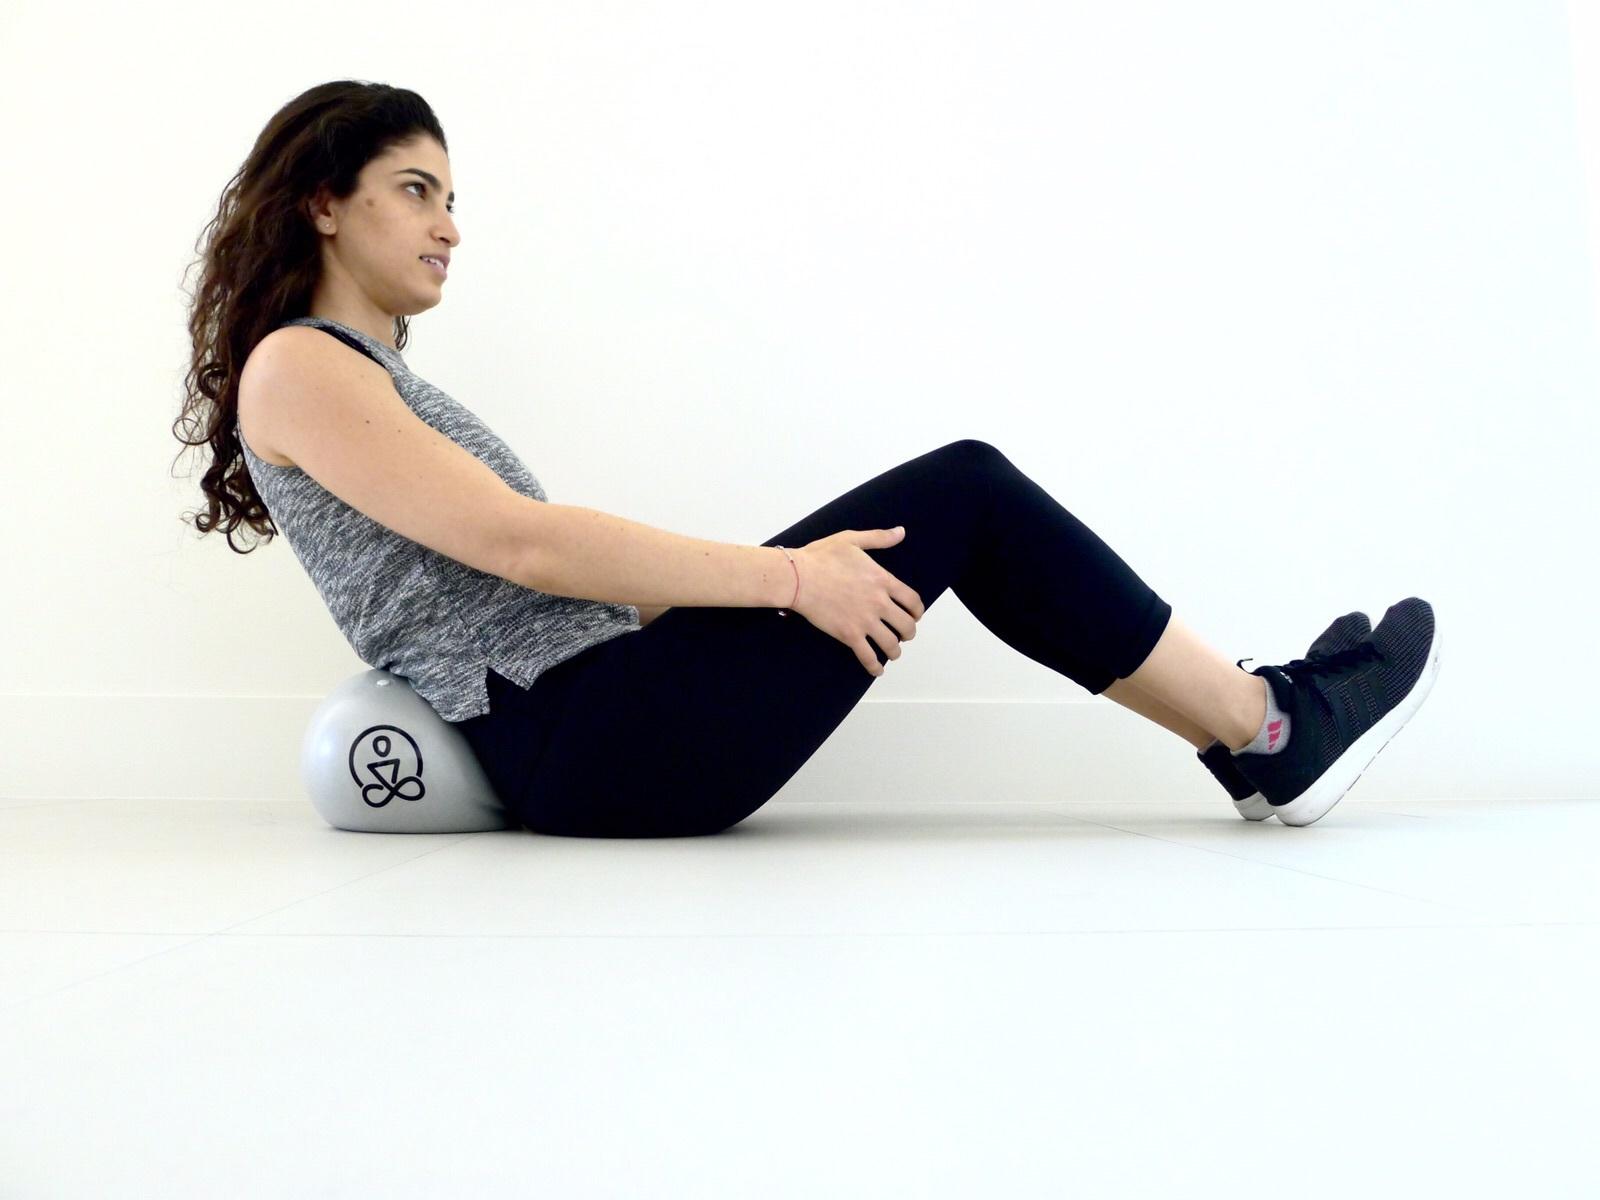 Coreball exercise image